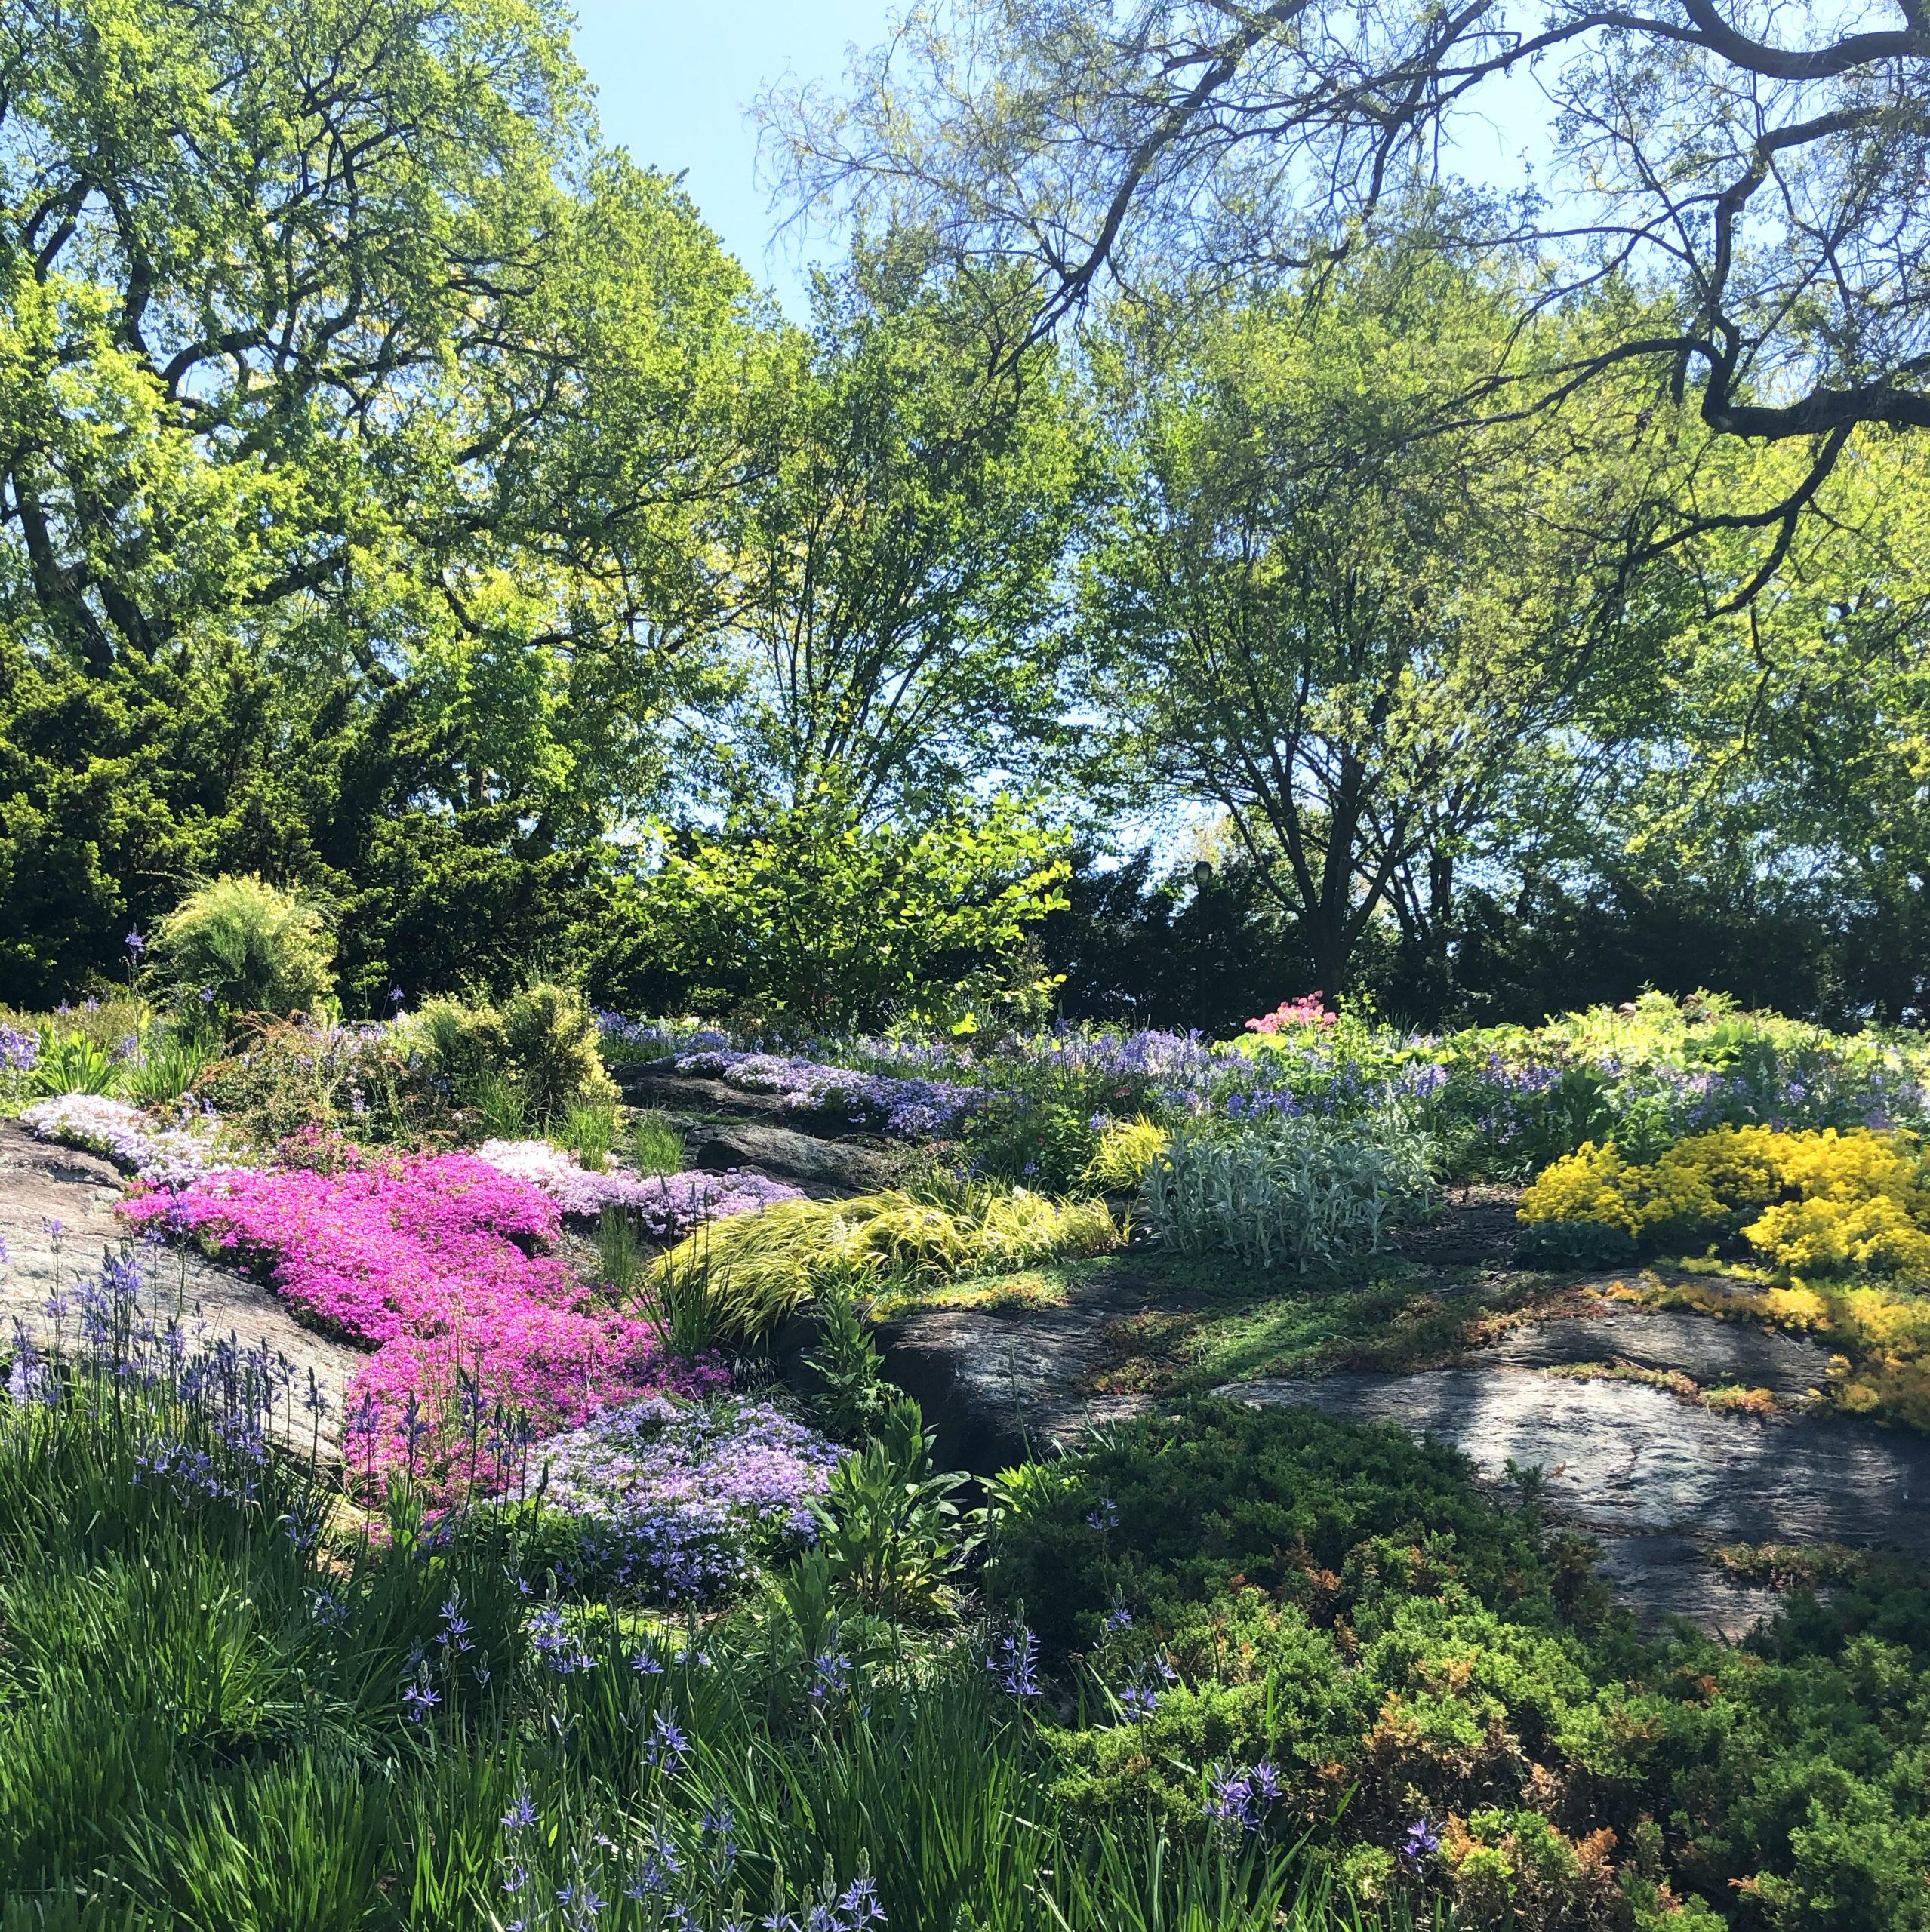 Into the Garden by Joanna Baker